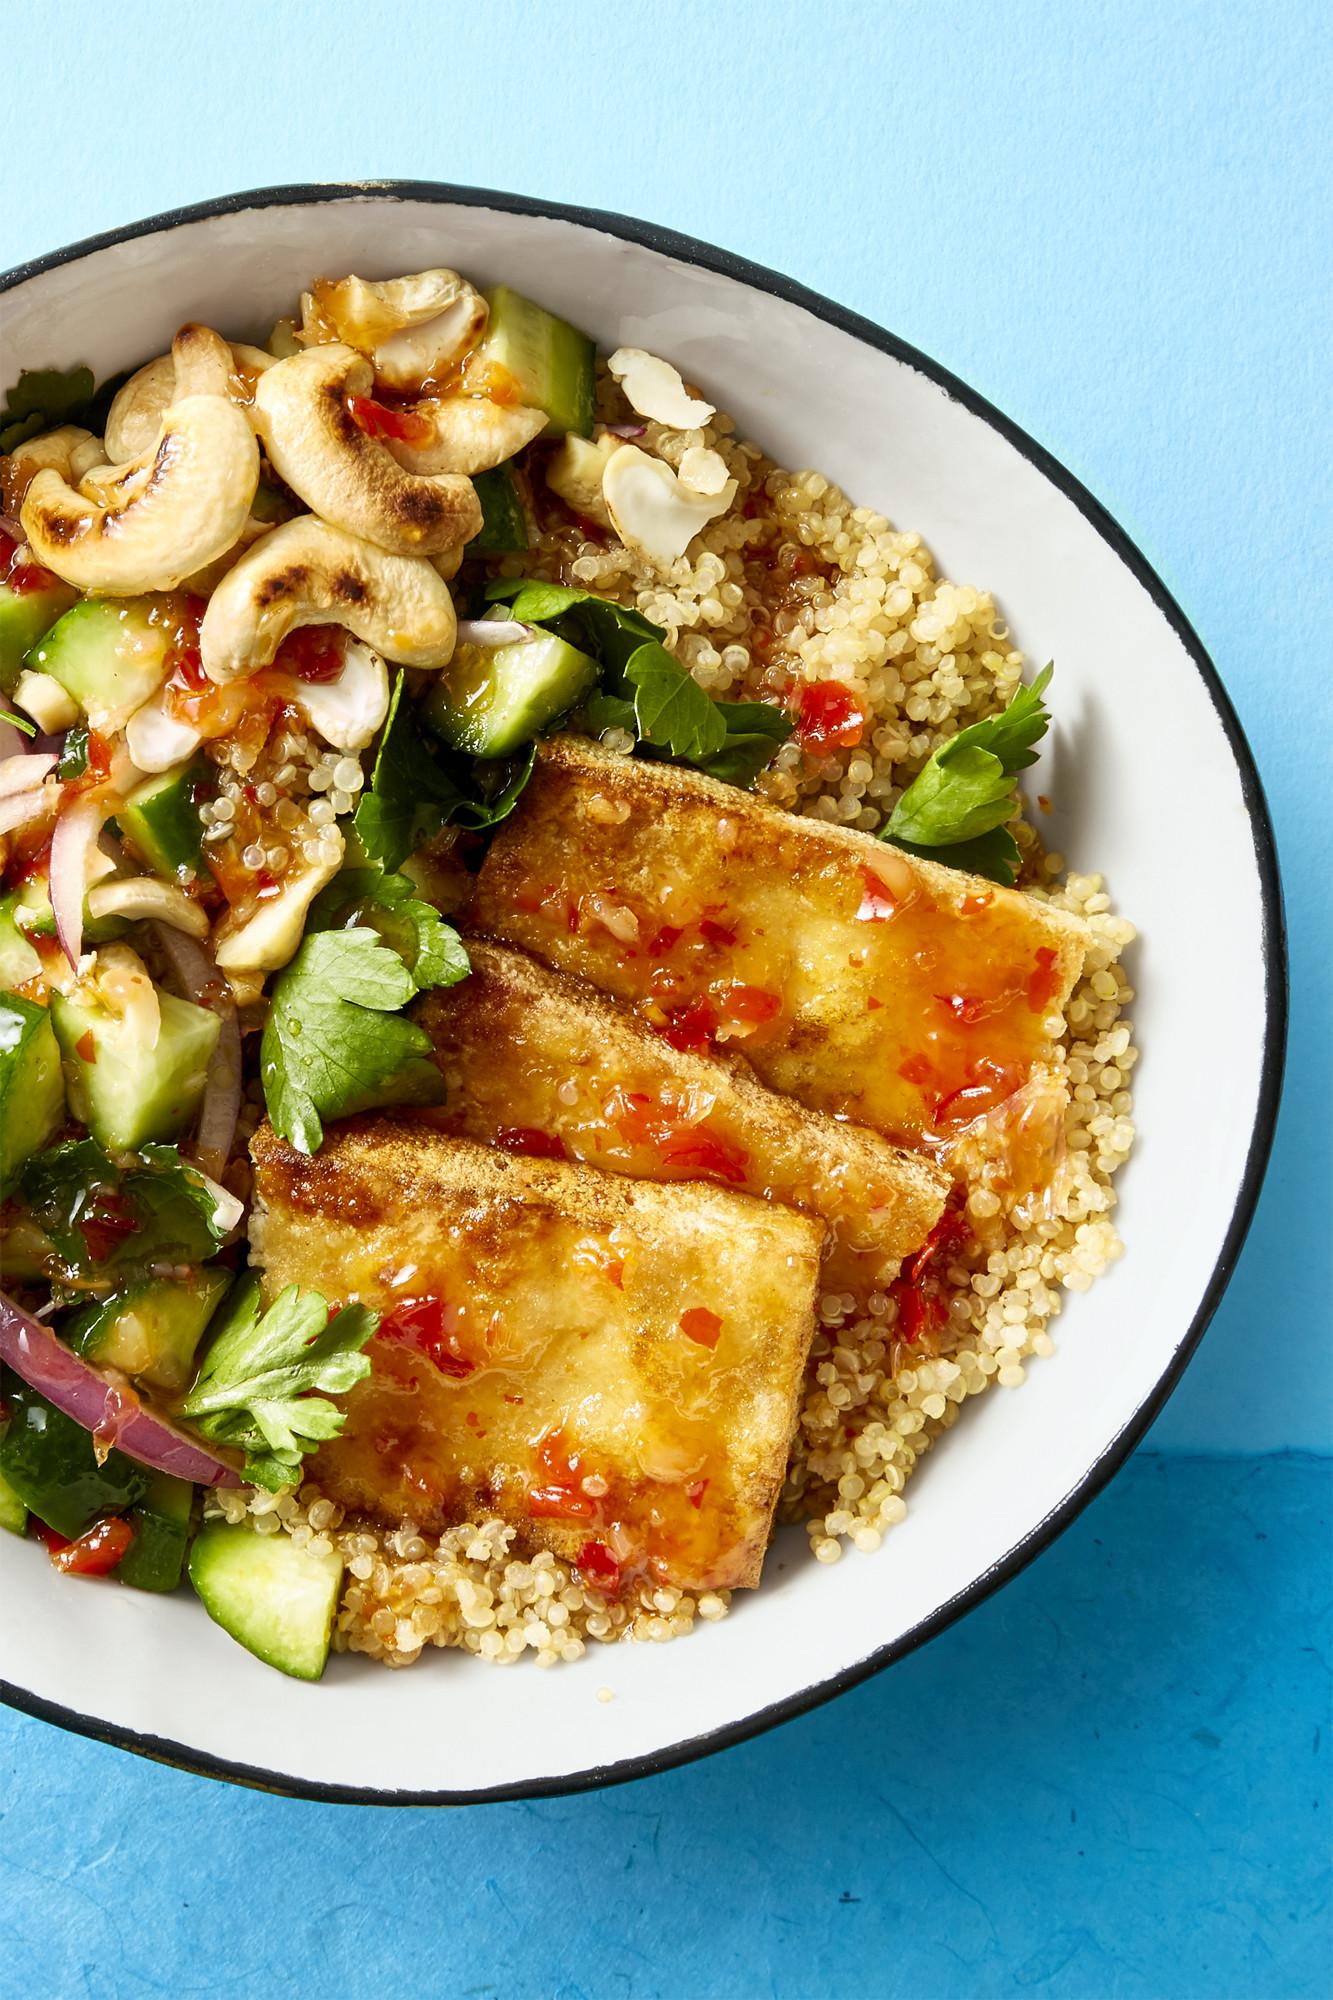 Simple Tofu Recipes  Best Crispy Tofu Bowl Recipe How to Make Crispy Tofu Bowl